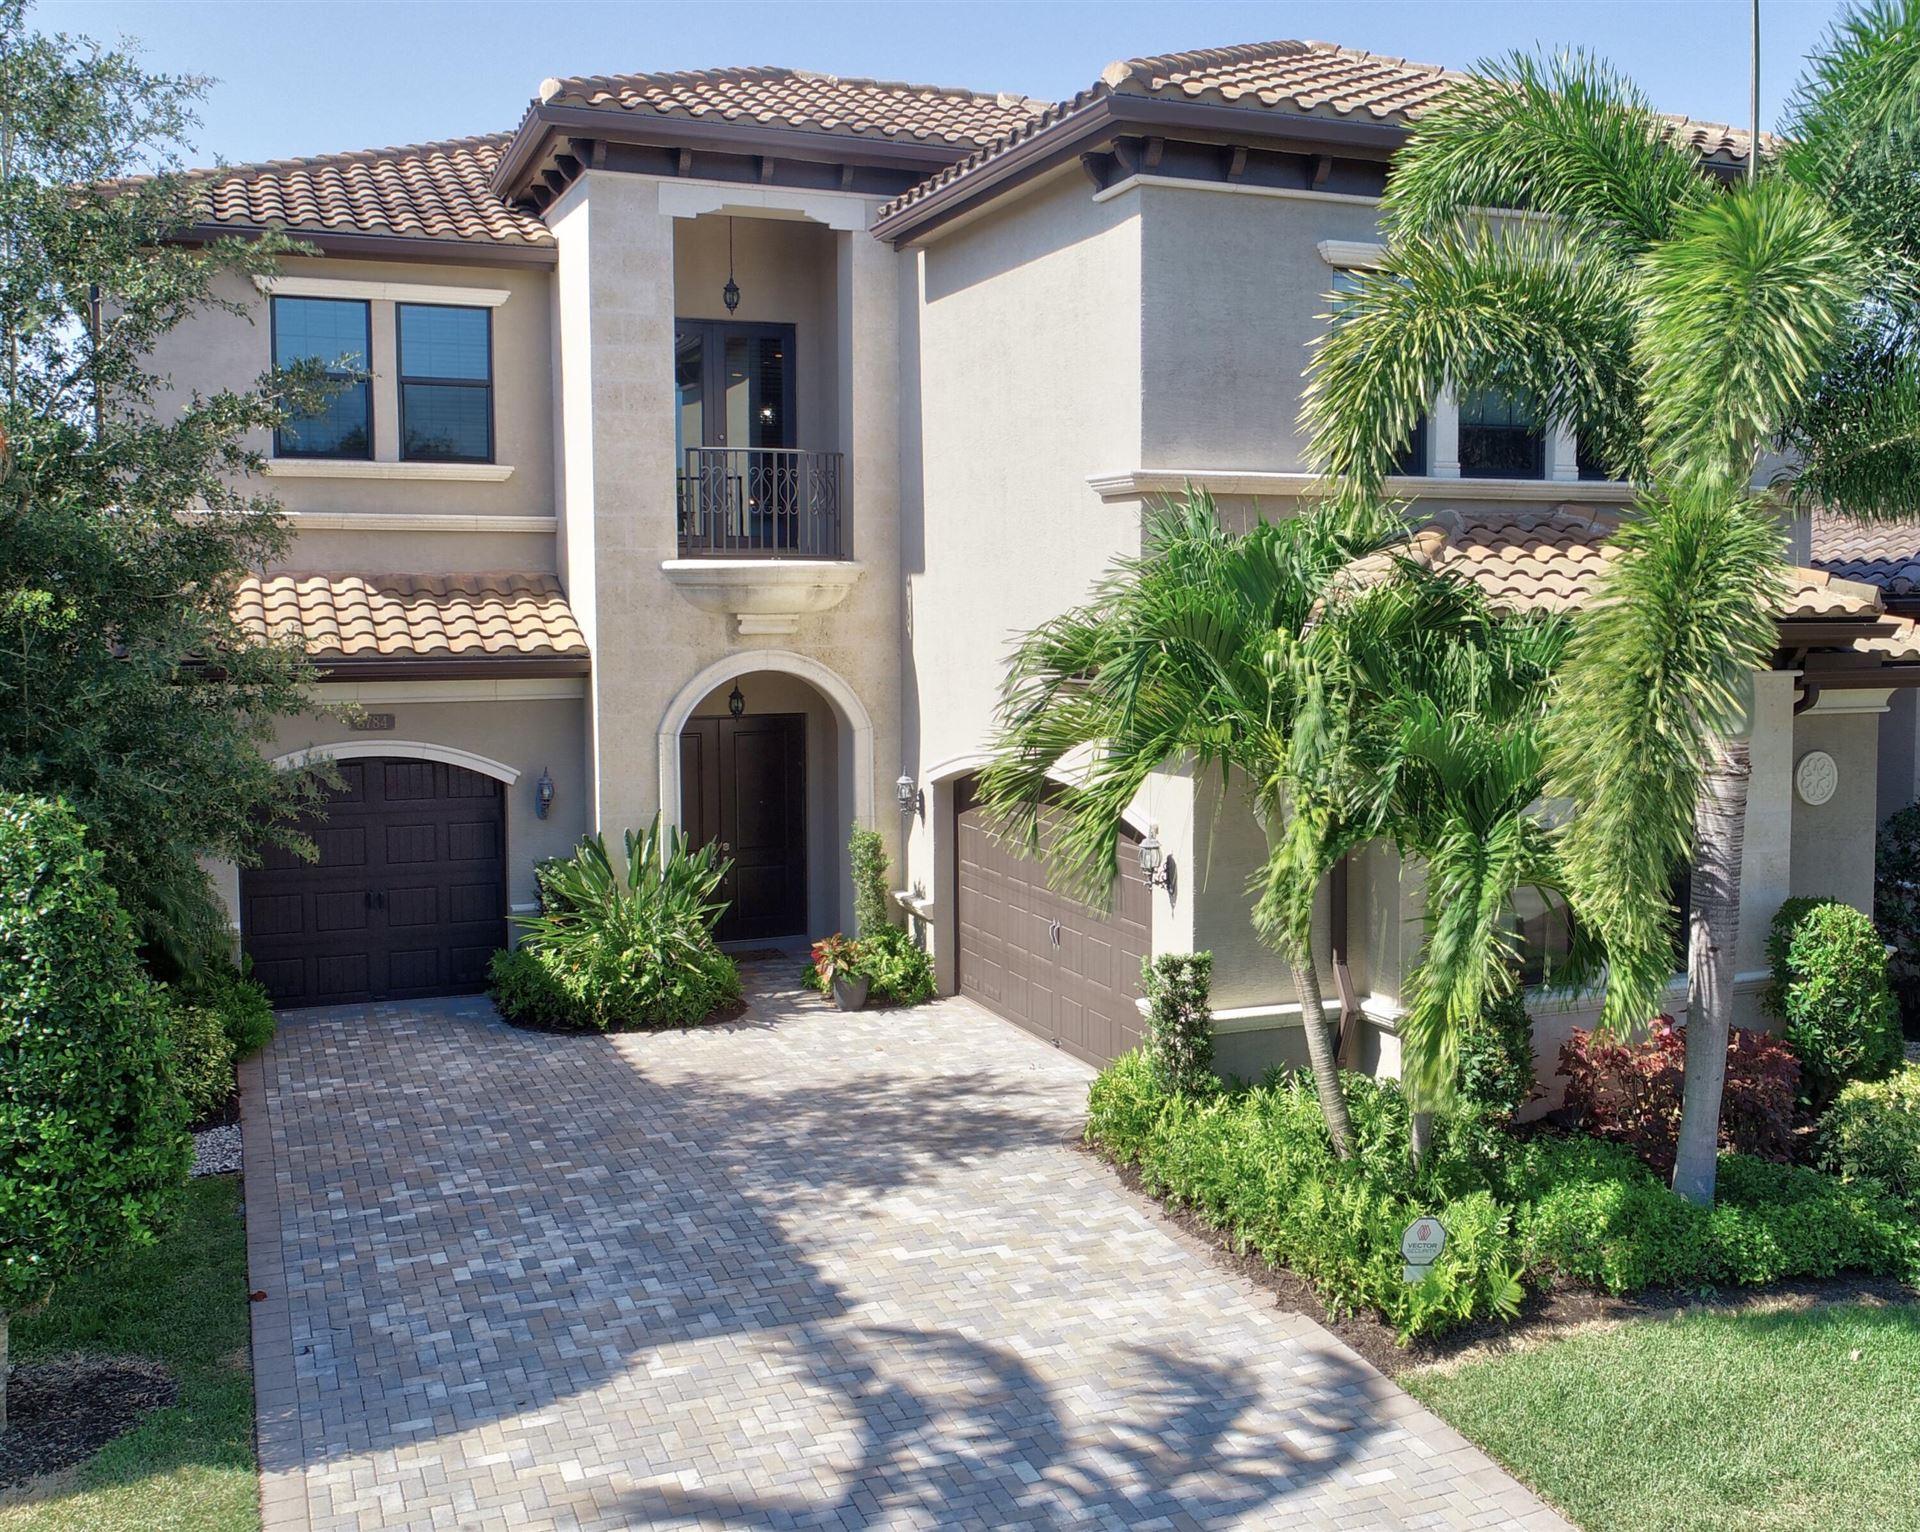 8784 Lewis River Road, Delray Beach, FL 33446 - MLS#: RX-10750175